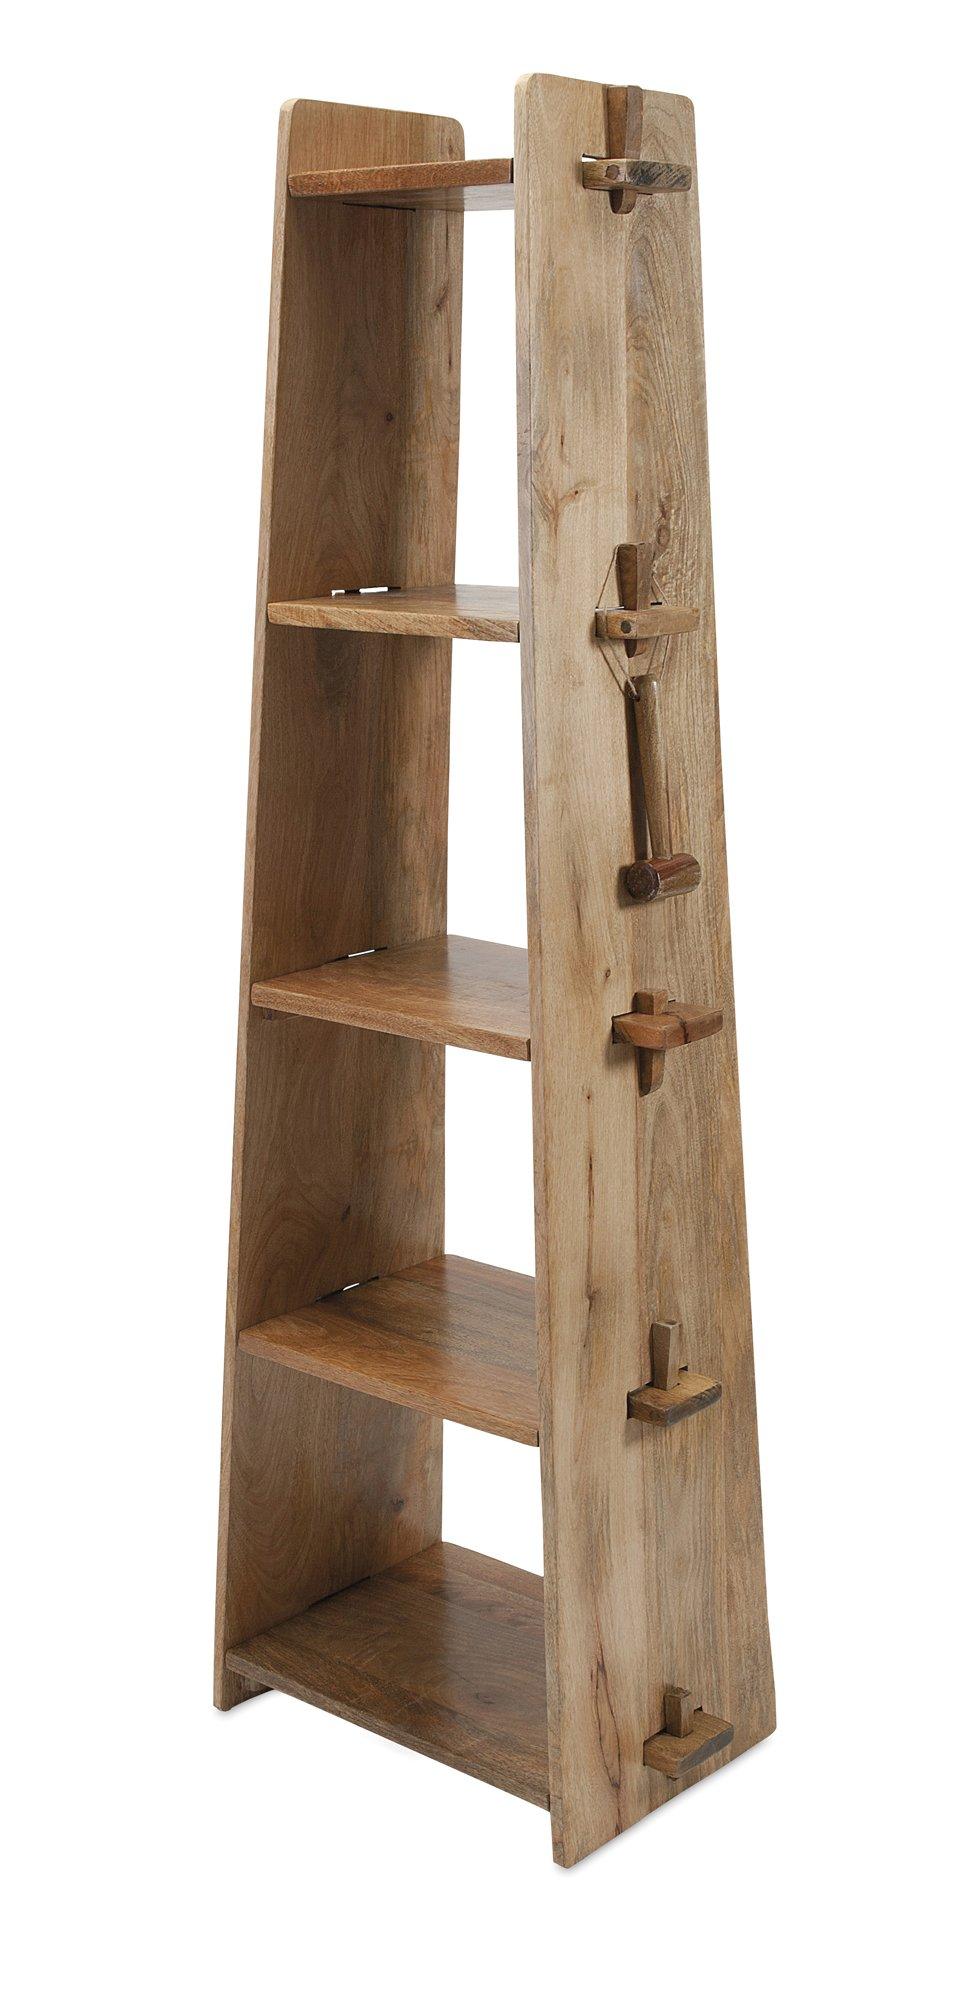 IMAX 89215 Bakkar Wood Shelf by Imax (Image #1)